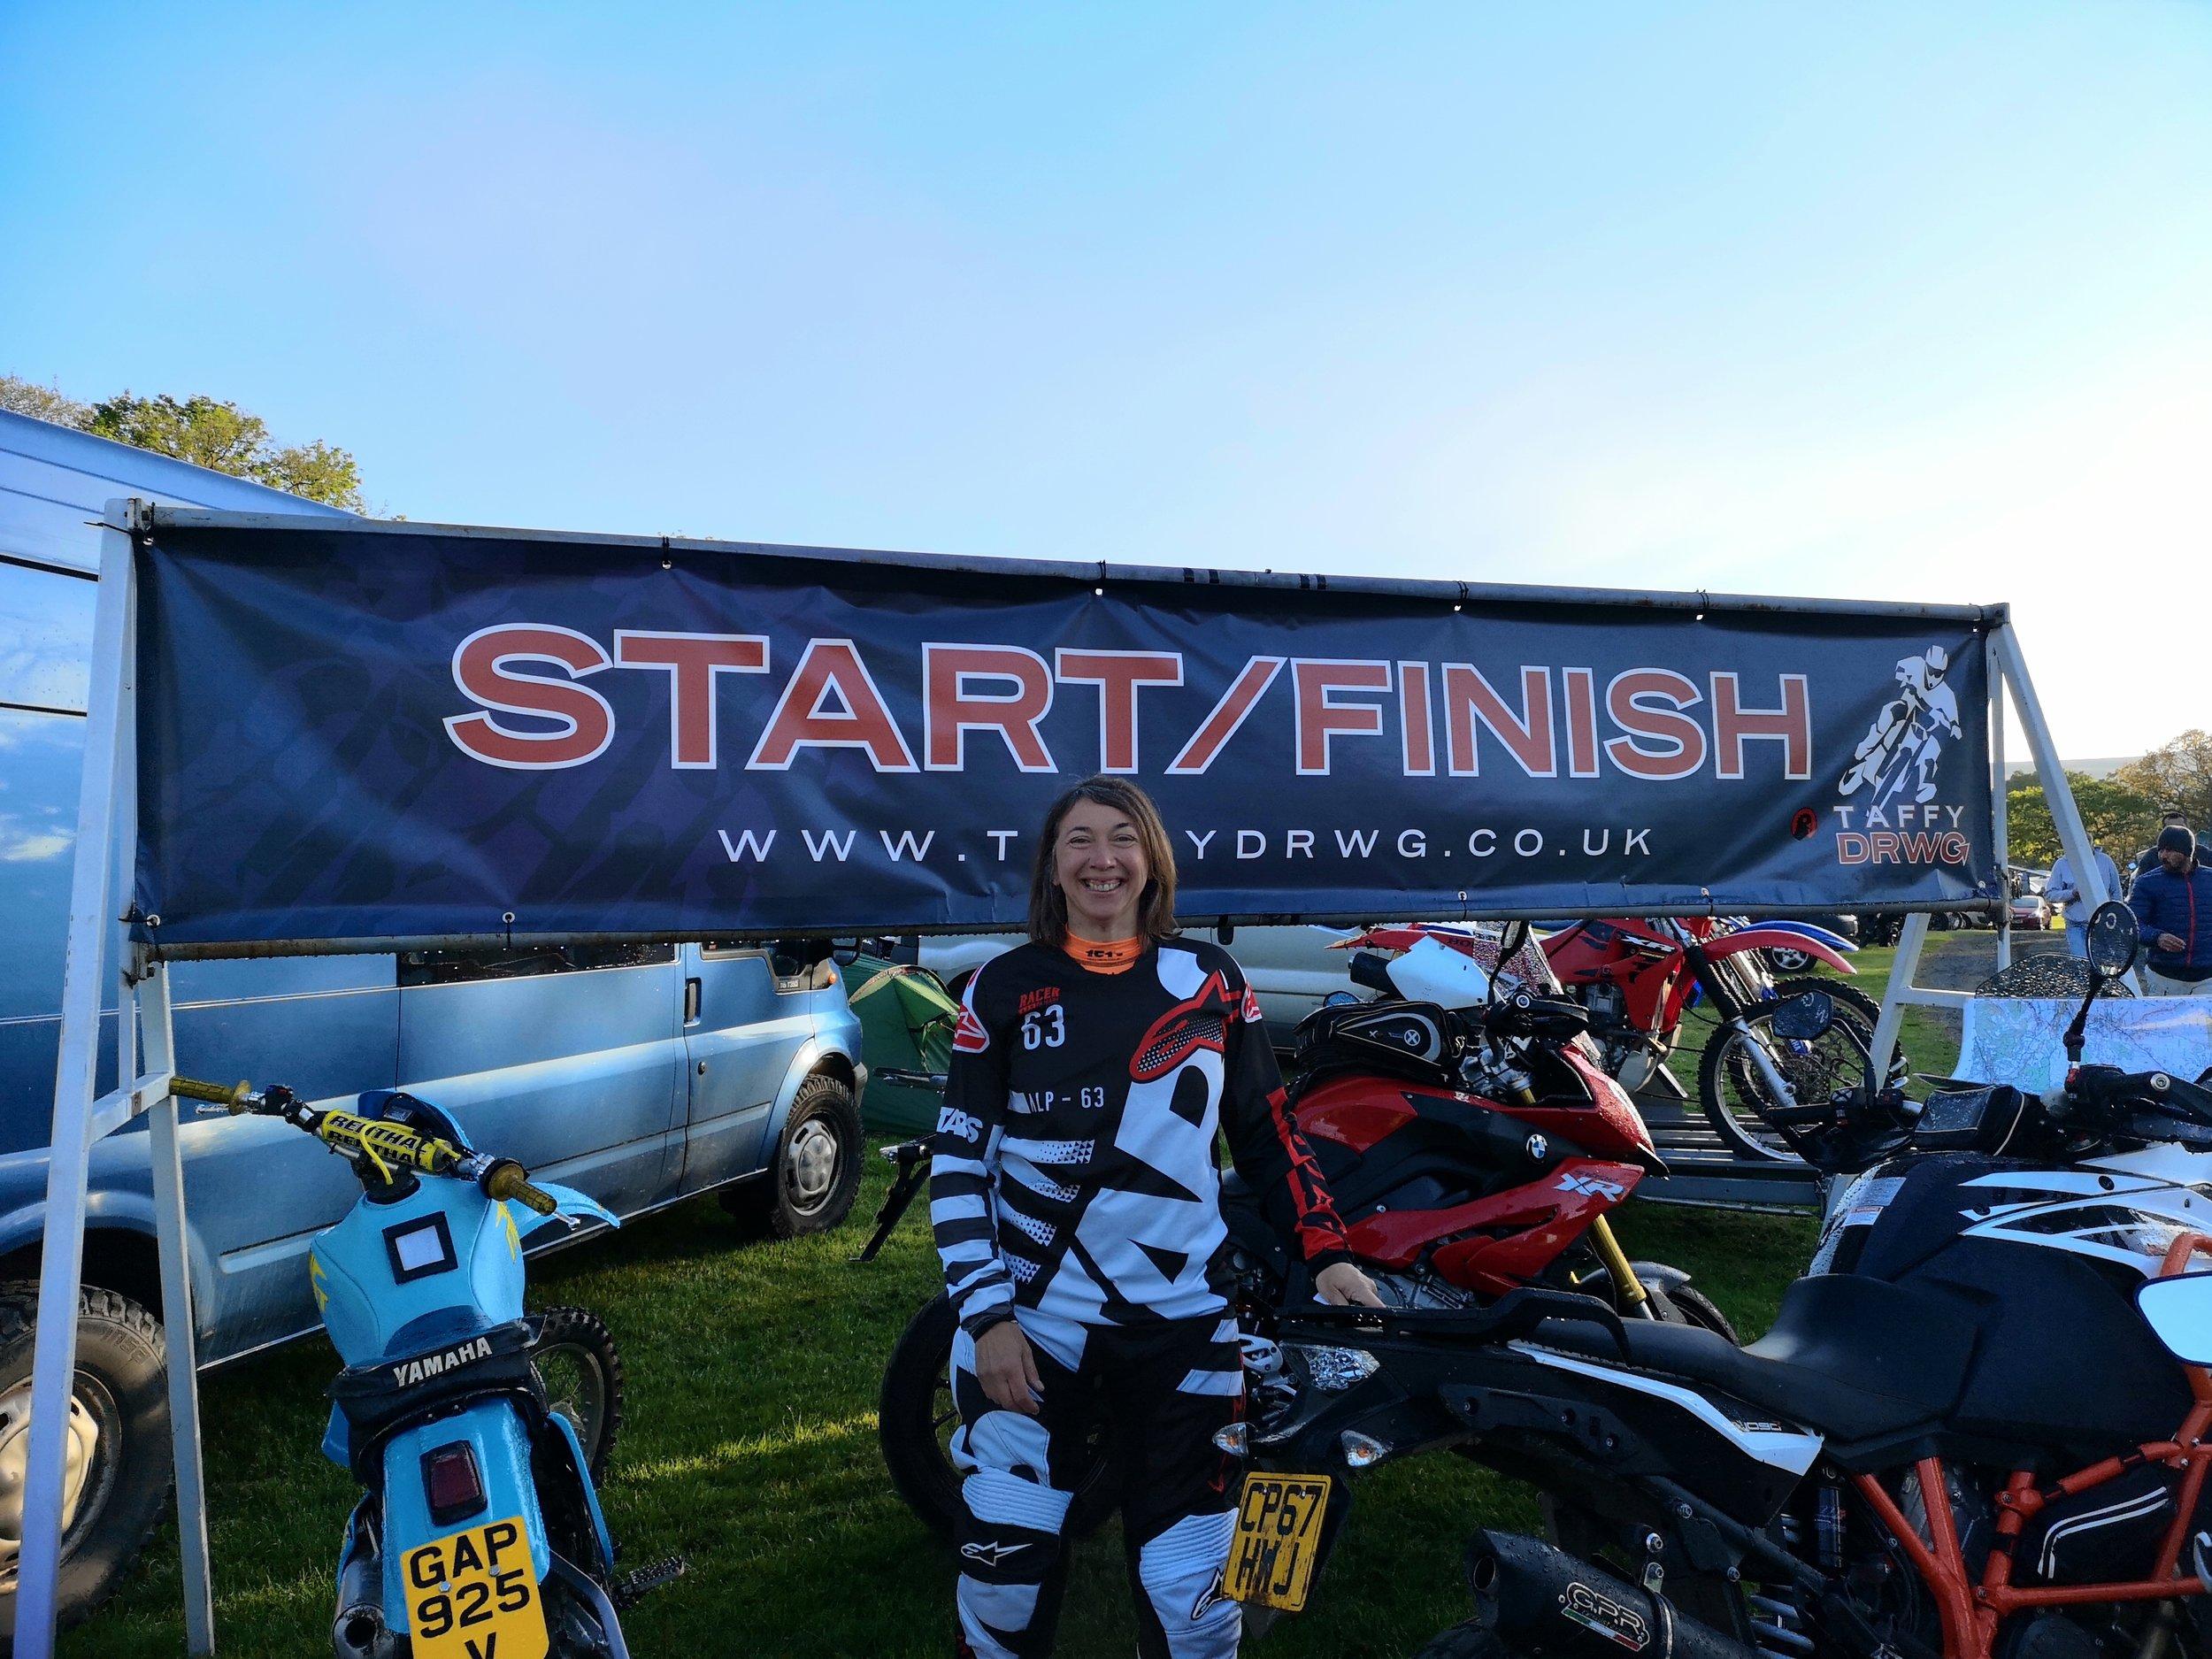 Louisa-Swaden-Adventure-Rider-Radio-Motorcycle-Podcast-4.jpg